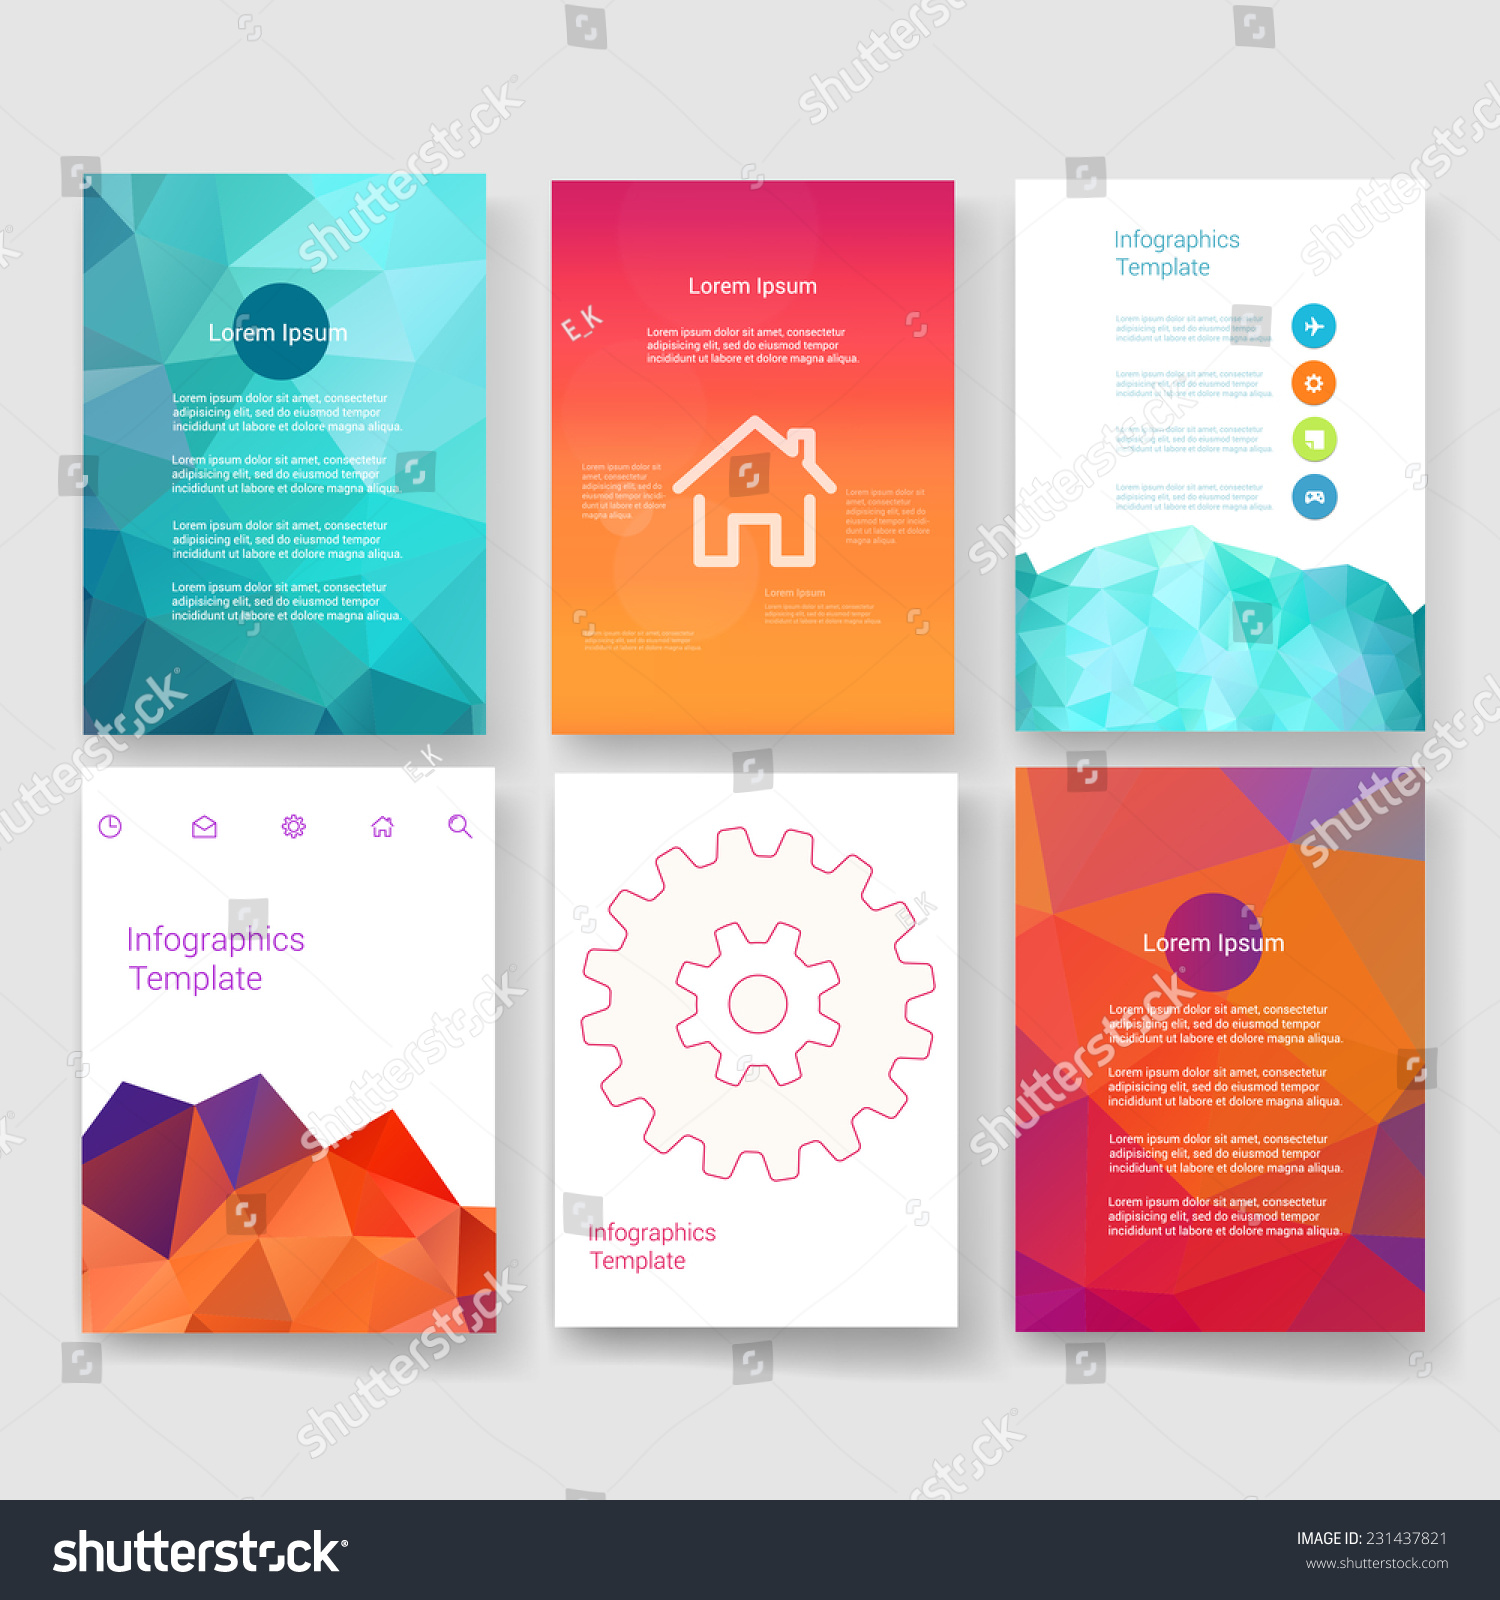 Flyer Brochure Design Templates Set Geometric Vector – Geometric Flyer Template